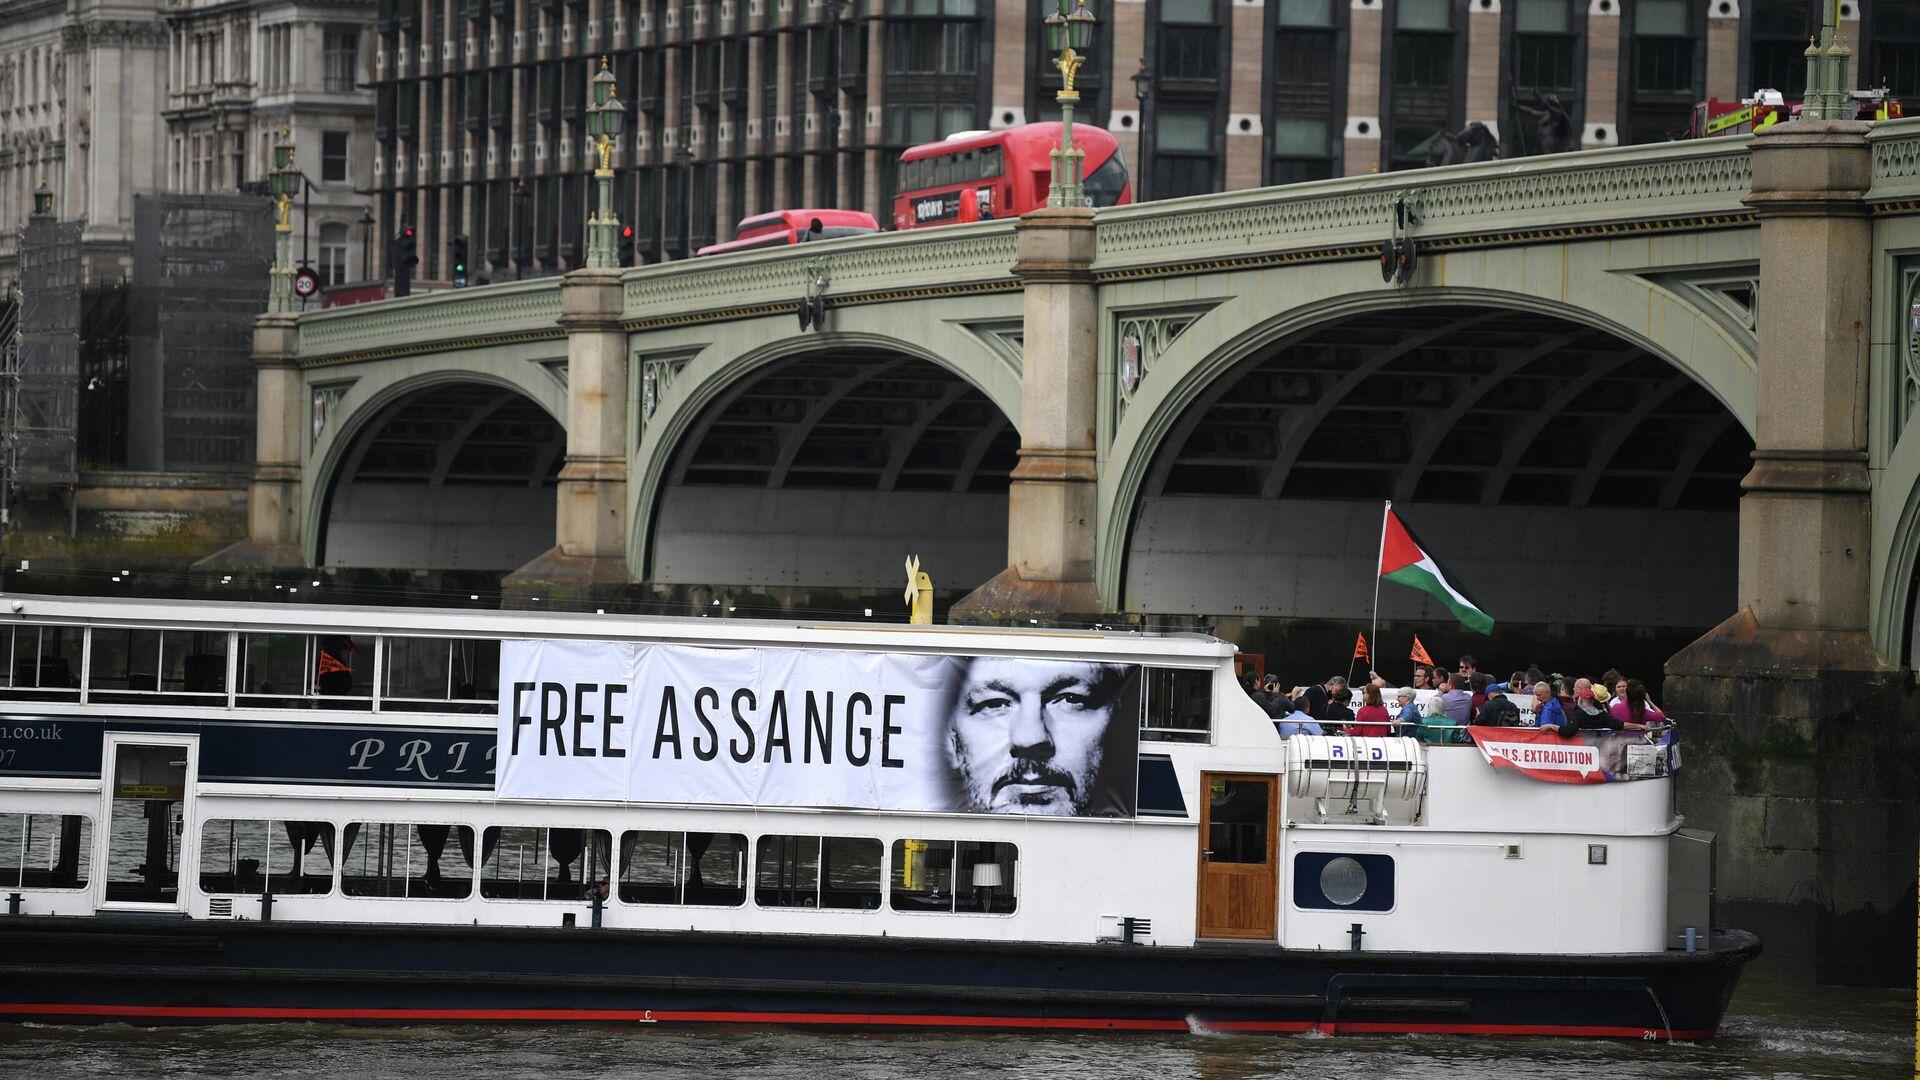 Un barco con una foto del fundador de Wikileaks, Julian Assange - Sputnik Mundo, 1920, 02.07.2021